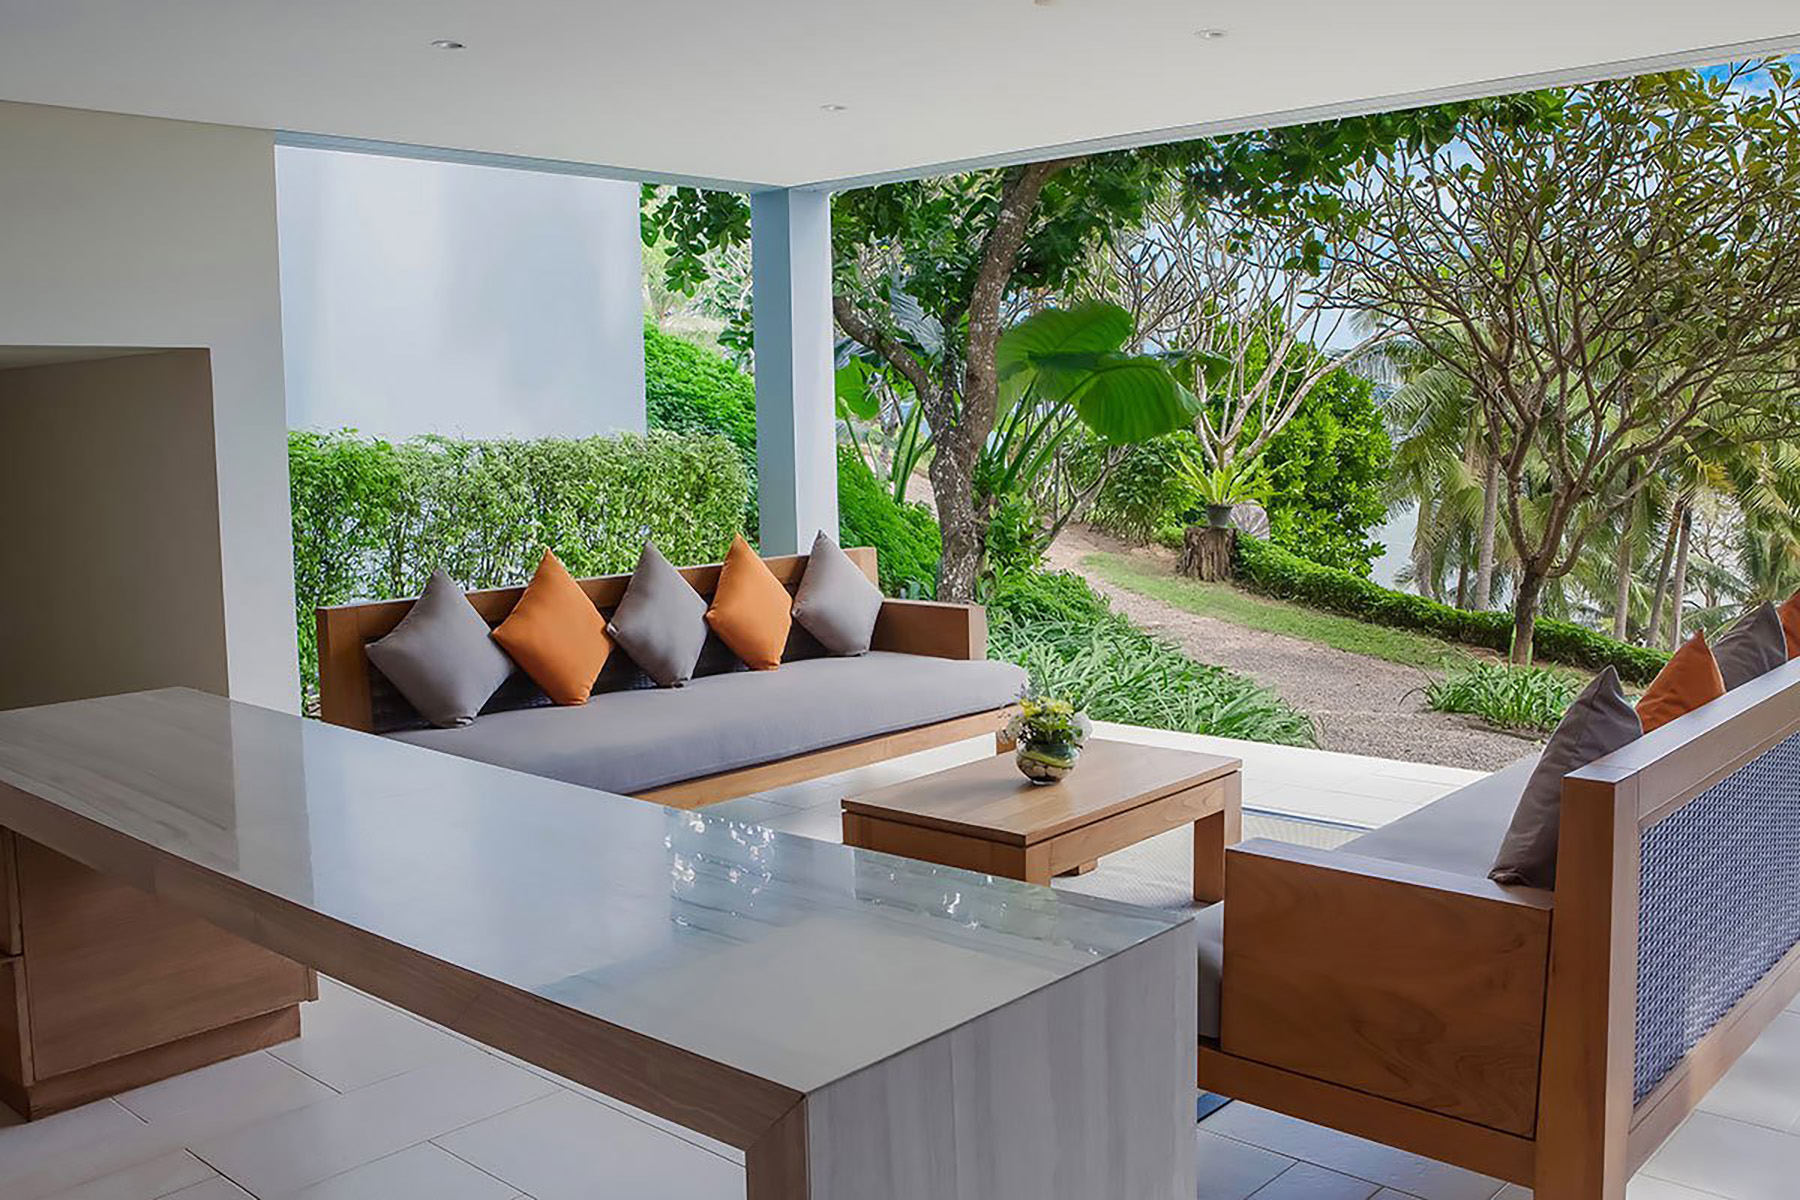 Modern patio set made from acacia wood slabs.